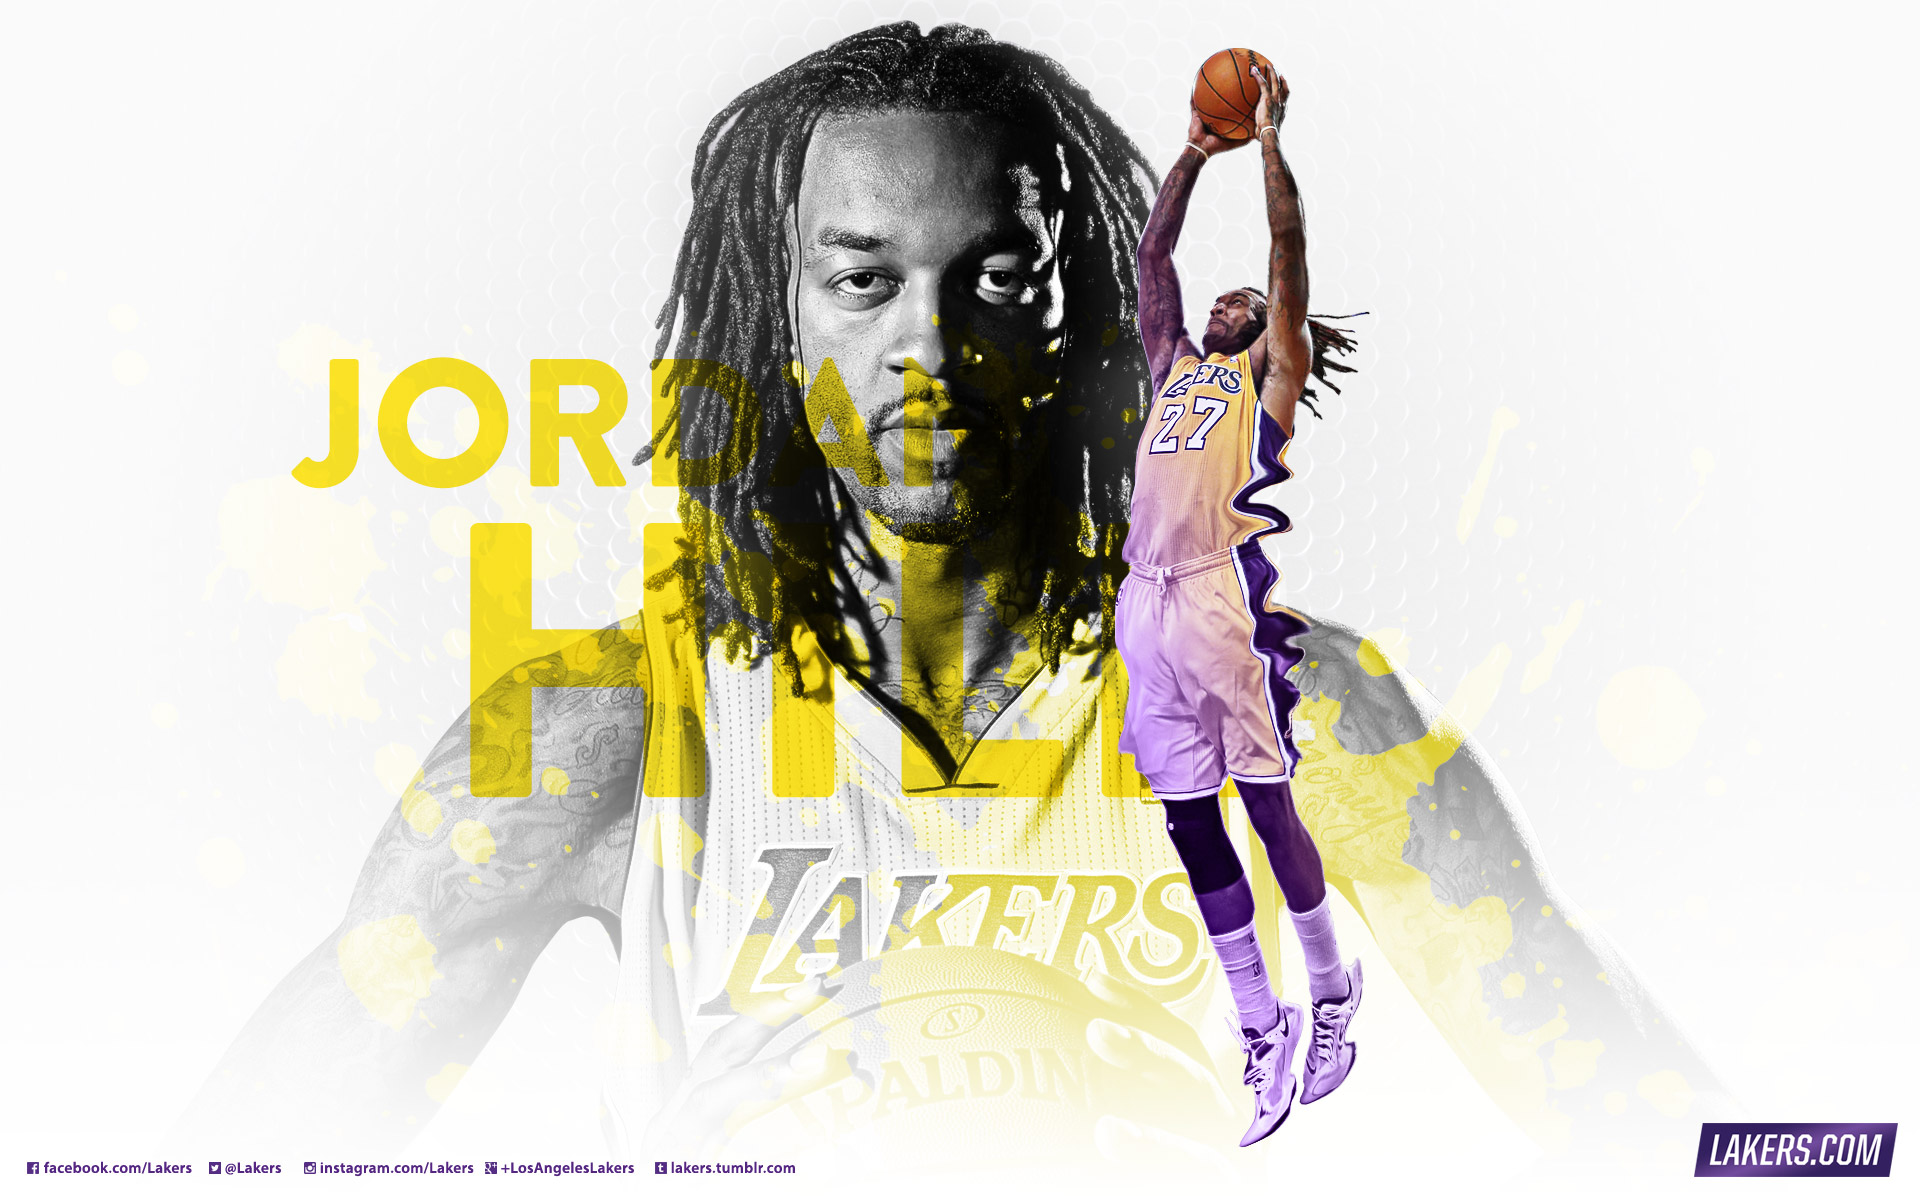 43] Nick Young Wallpaper Lakers on WallpaperSafari 1920x1200